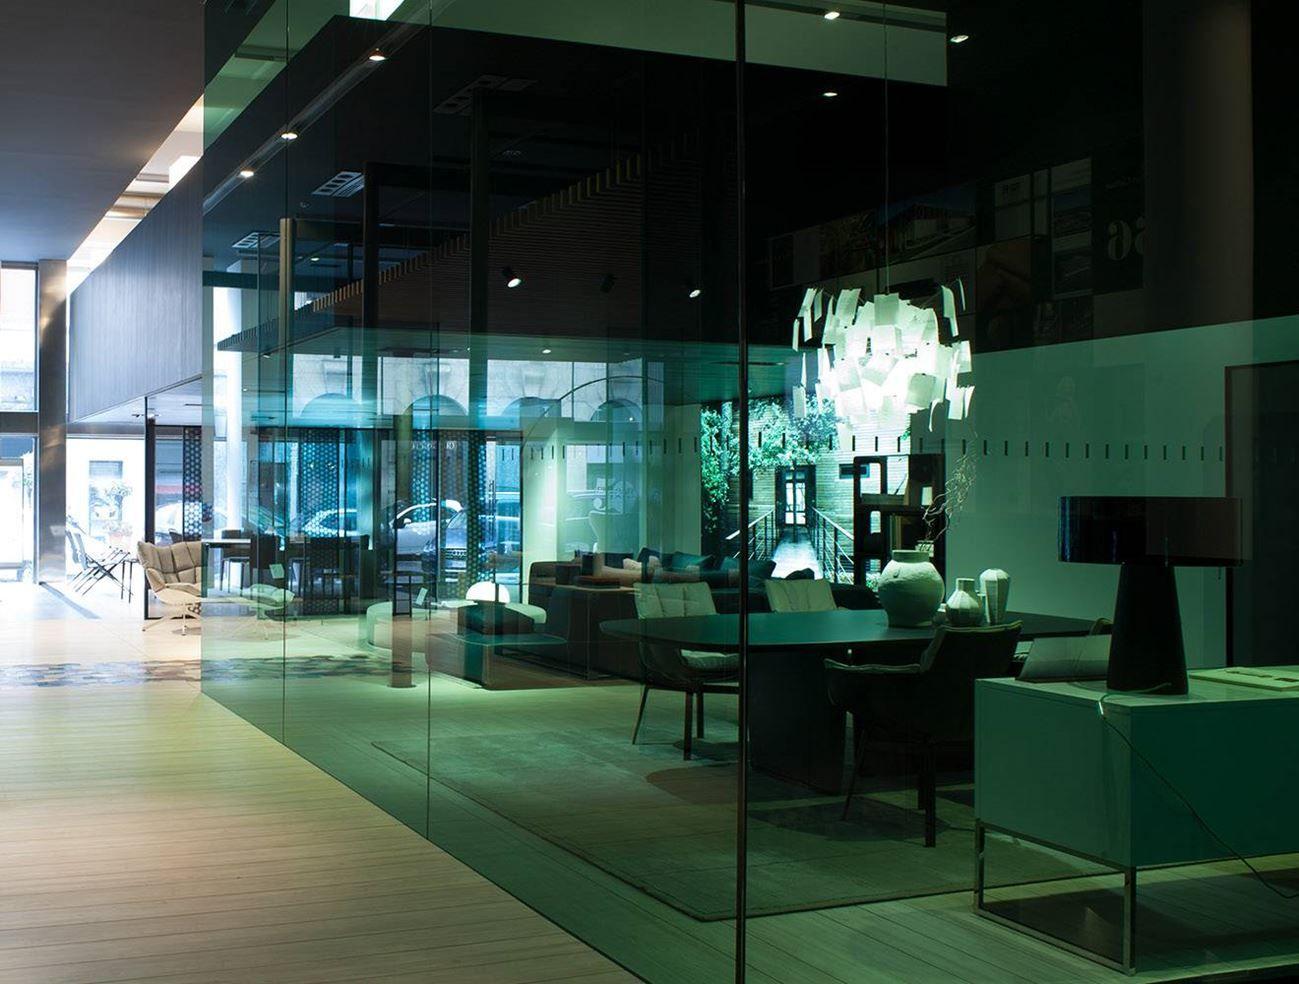 B&B Italia Milano - Picture gallery | B&B Italia Milano | Pinterest ...